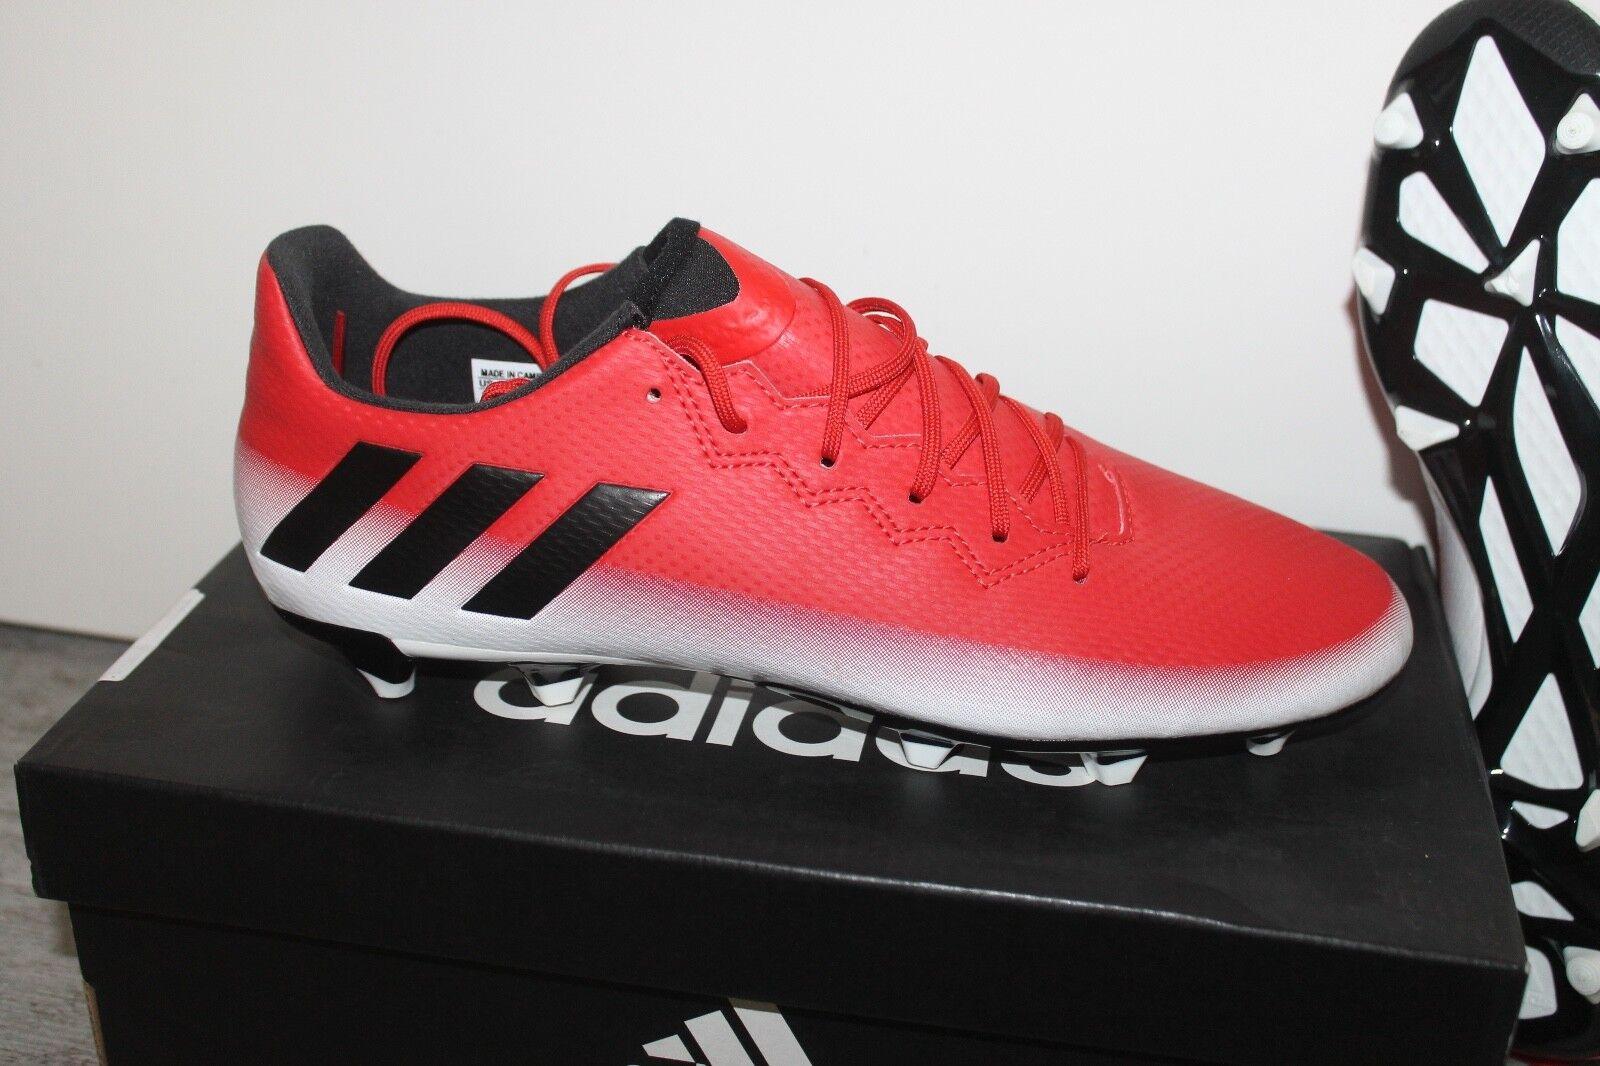 92e786f232b Adidas Messi 16.3 FG Fútbol Hombre leva Todos Las sizes red whiteo black  NUEVO